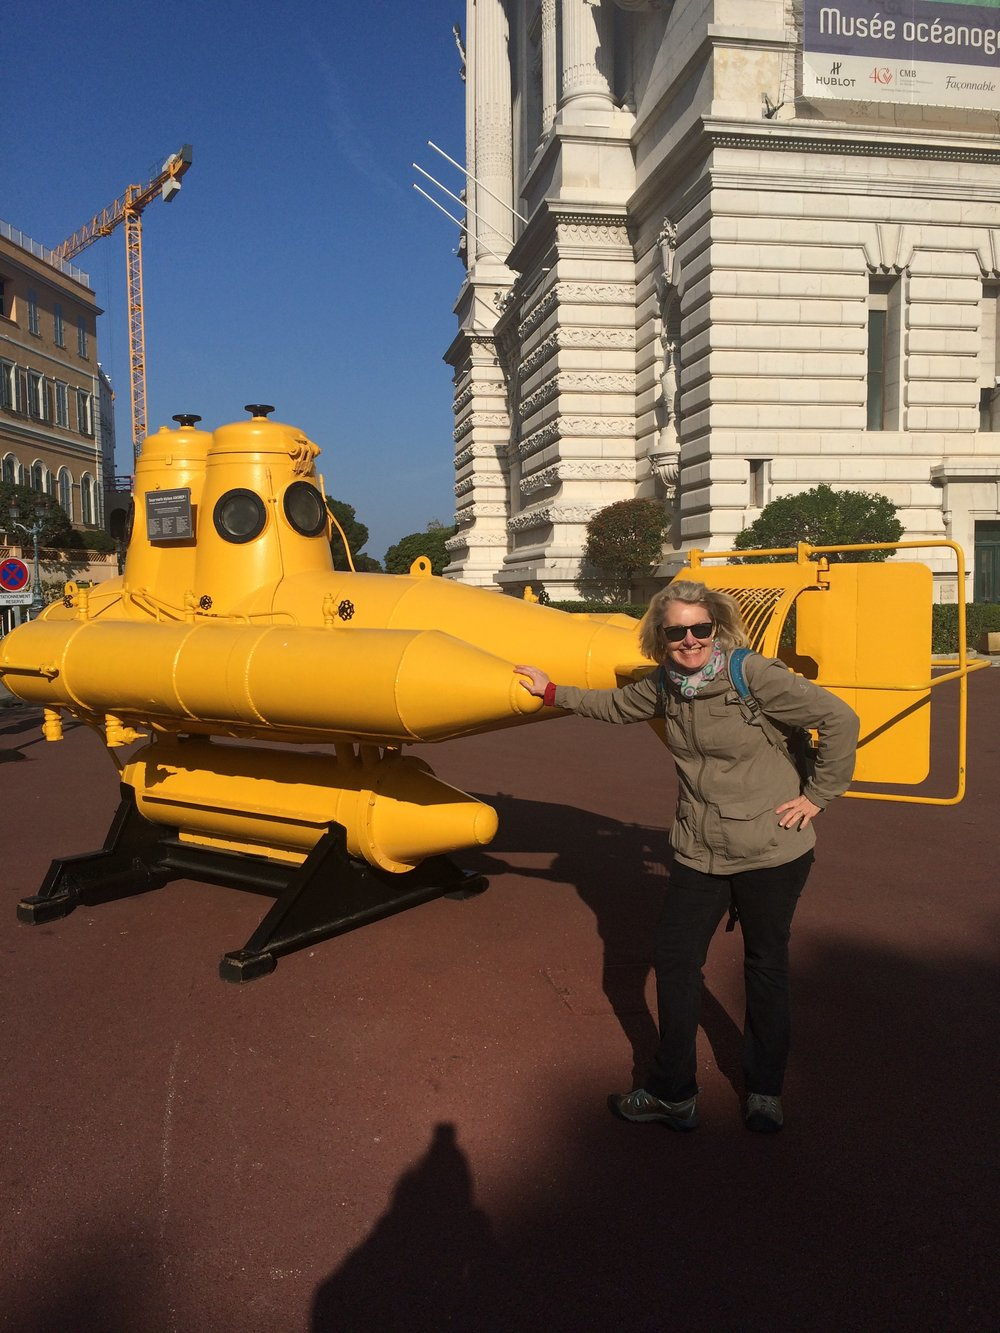 Jacque Costeau's submarine